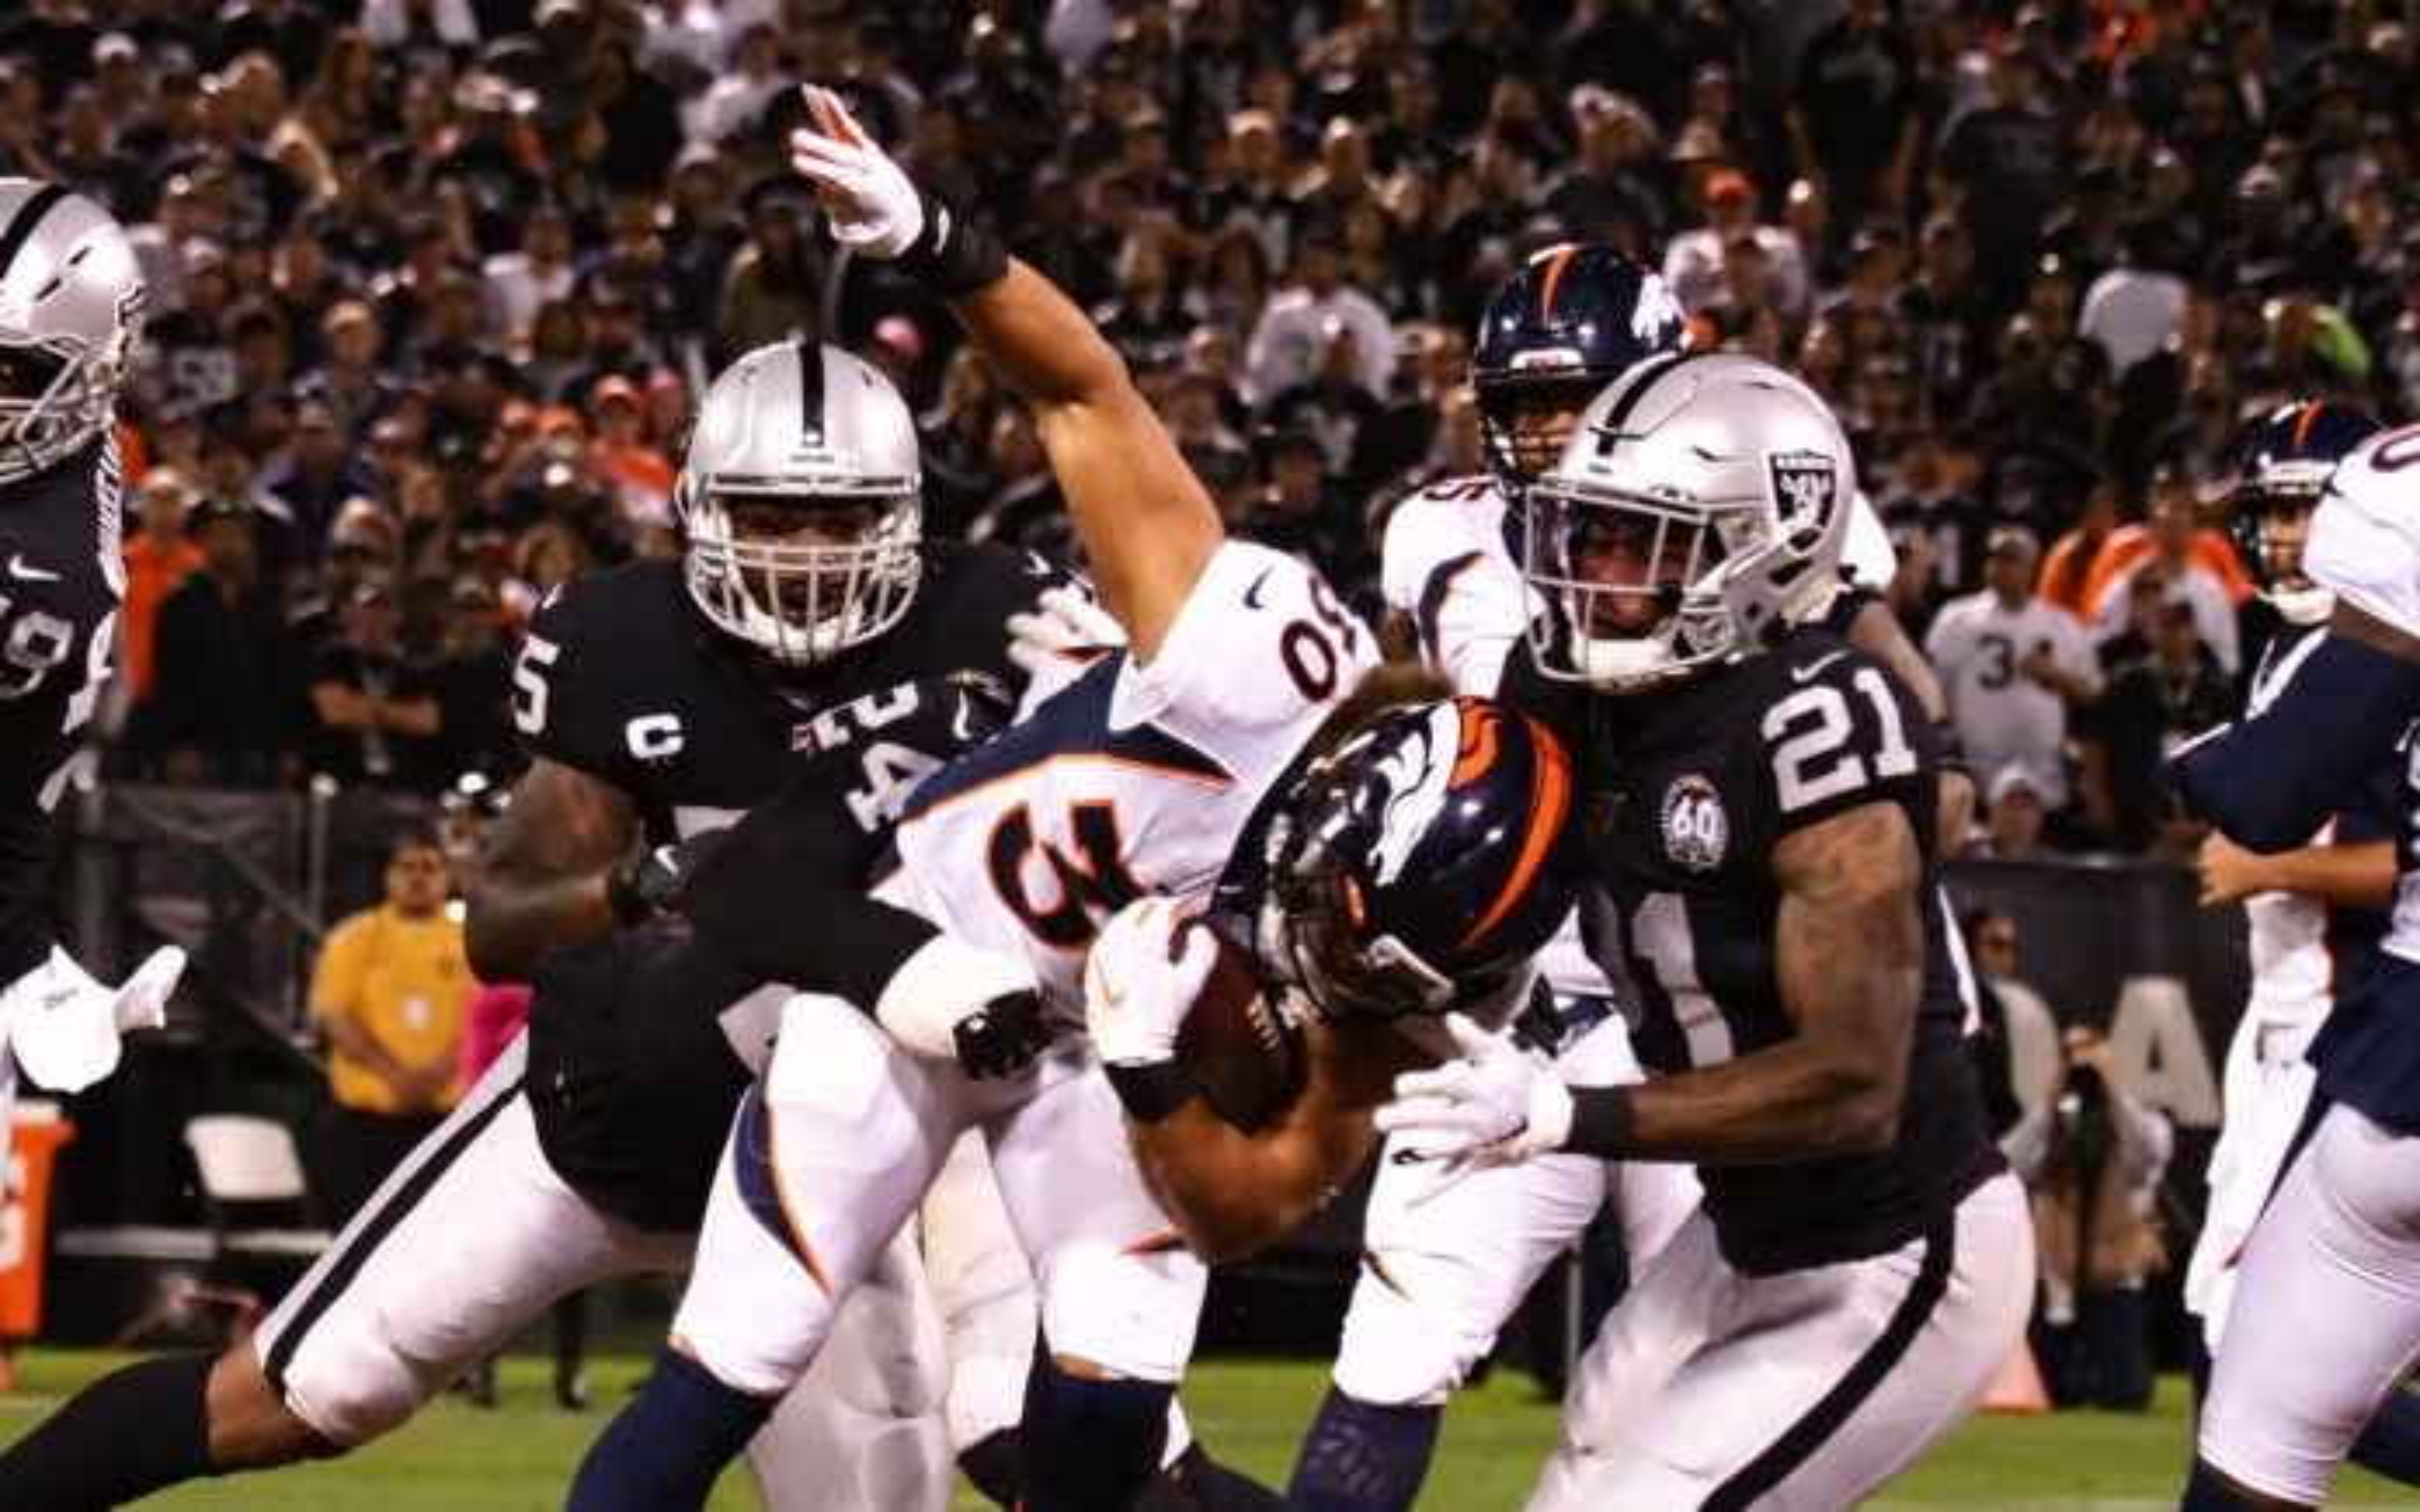 Phillip Lindsay tackled. Credit: Kelley L. Cox, USA TODAY Sports.